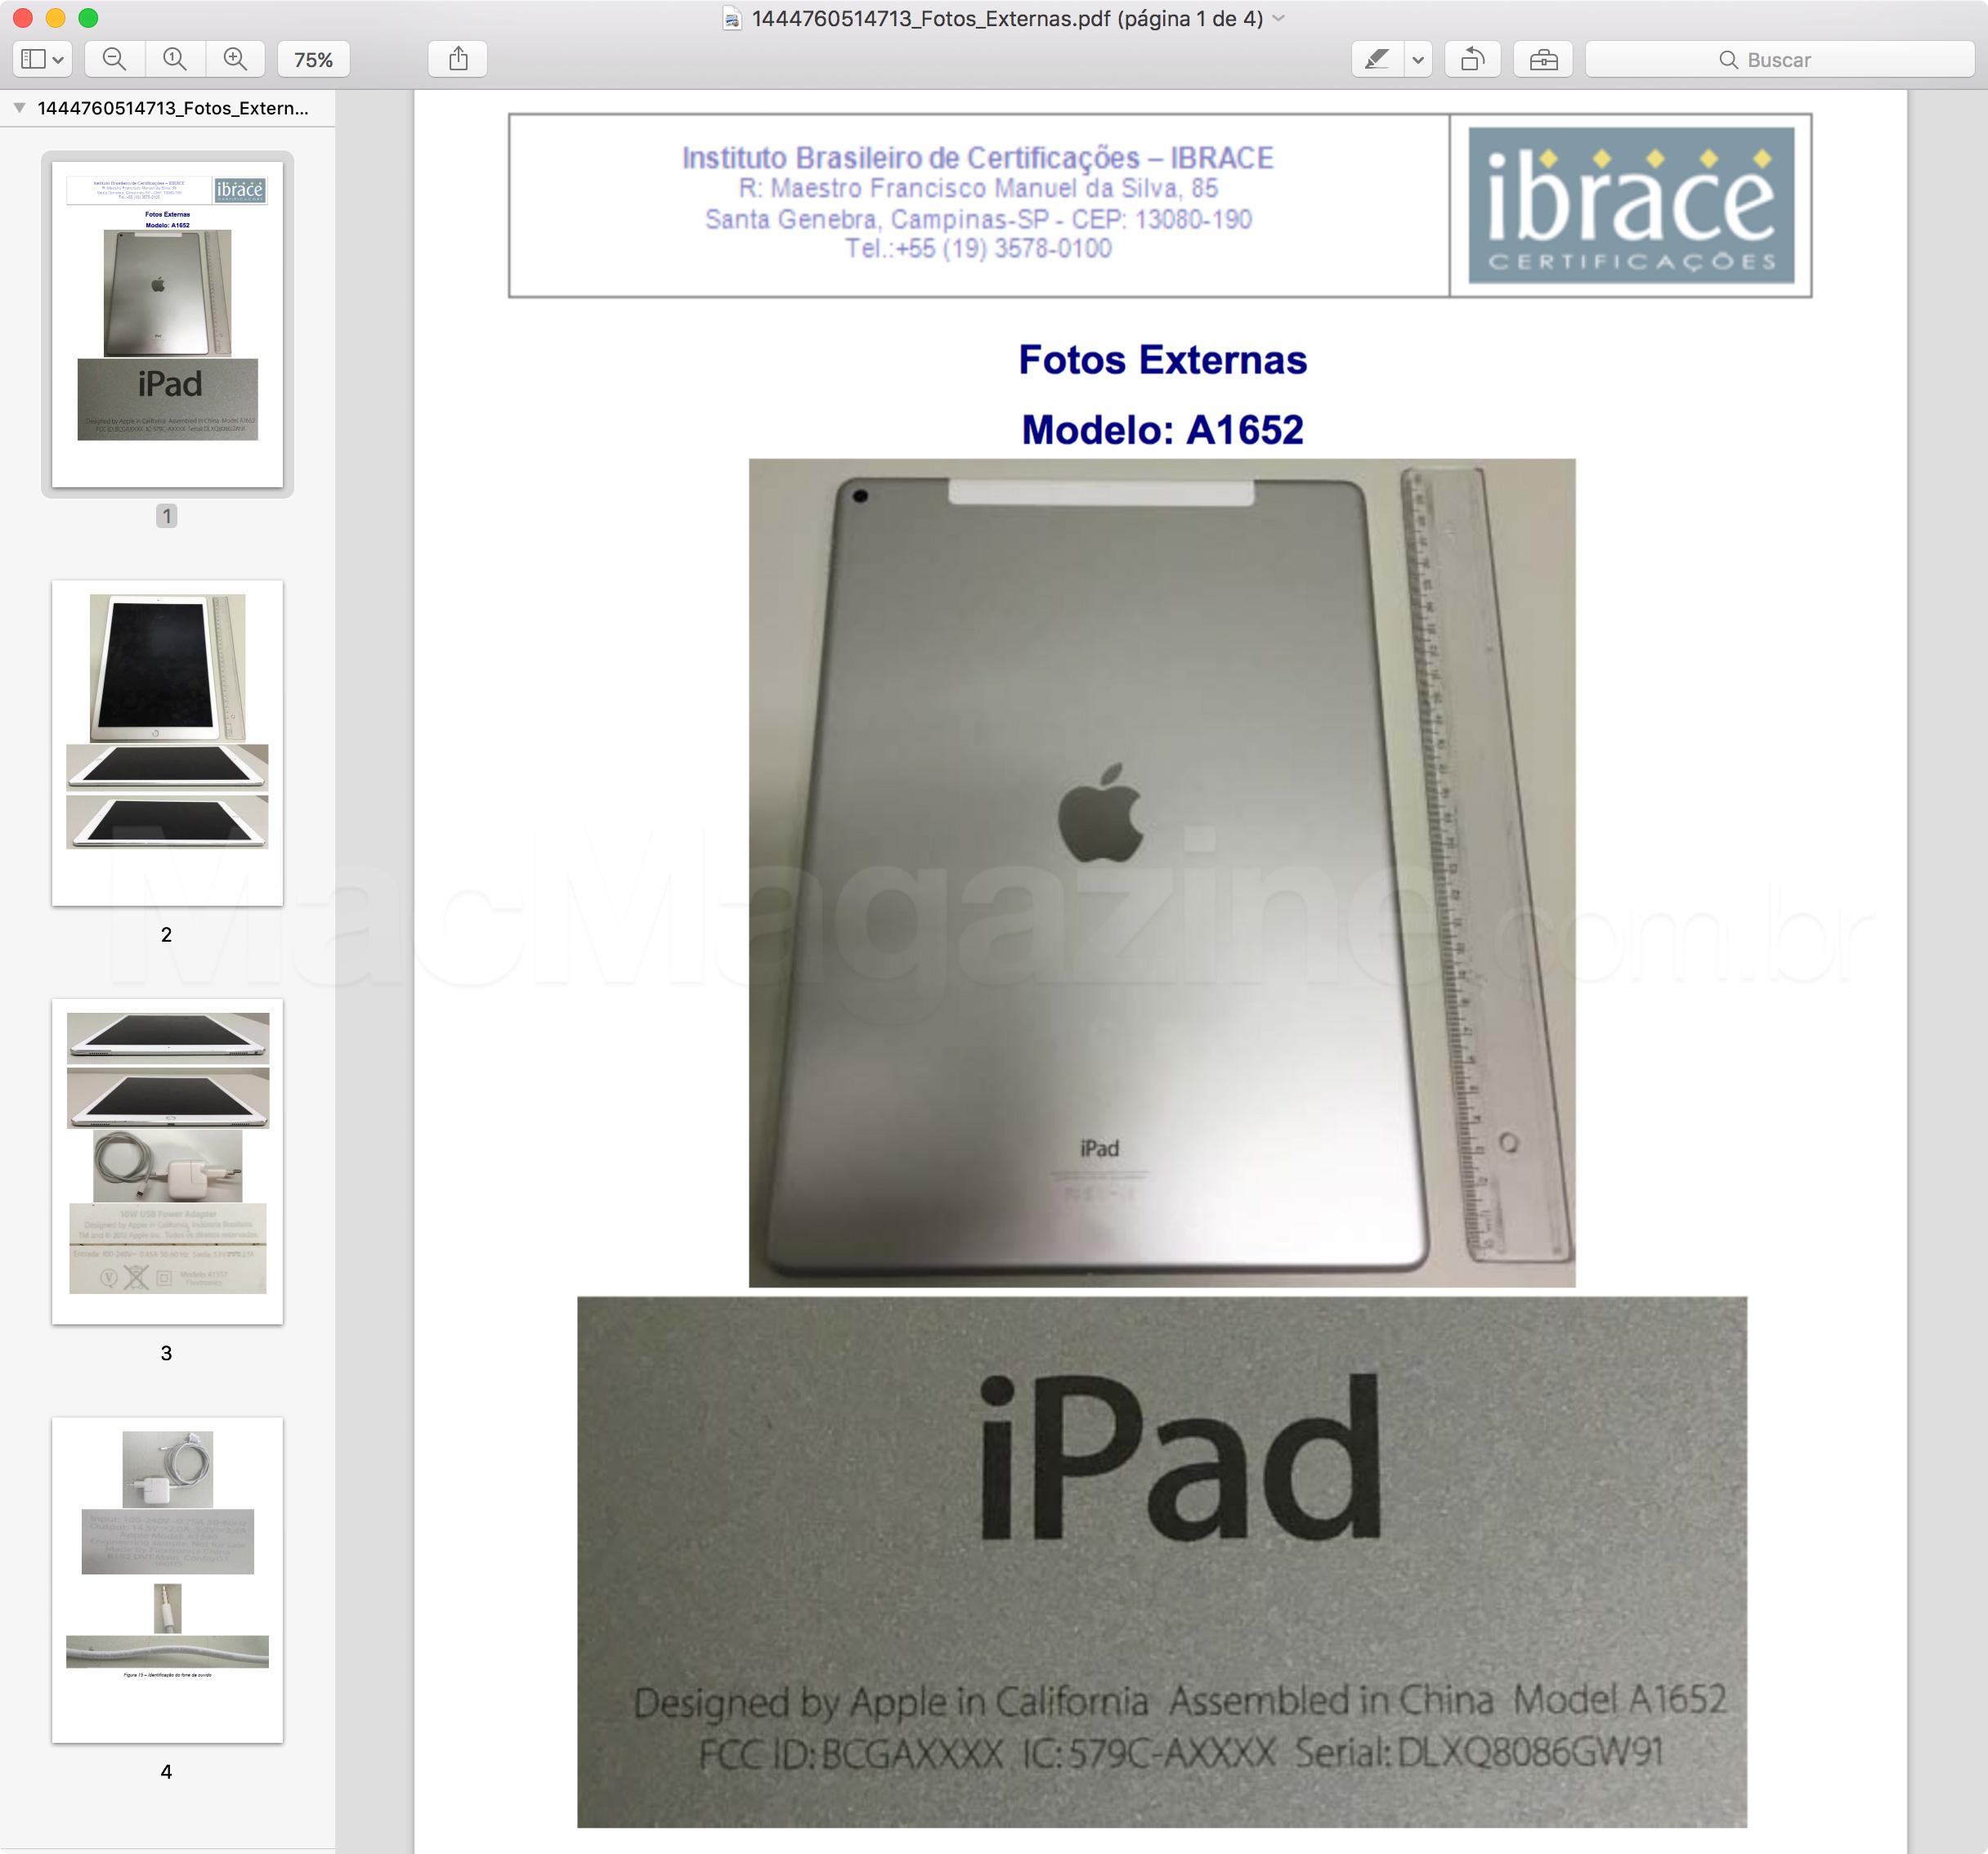 iPad Pro Wi-Fi + Cellular homologado pela Anatel